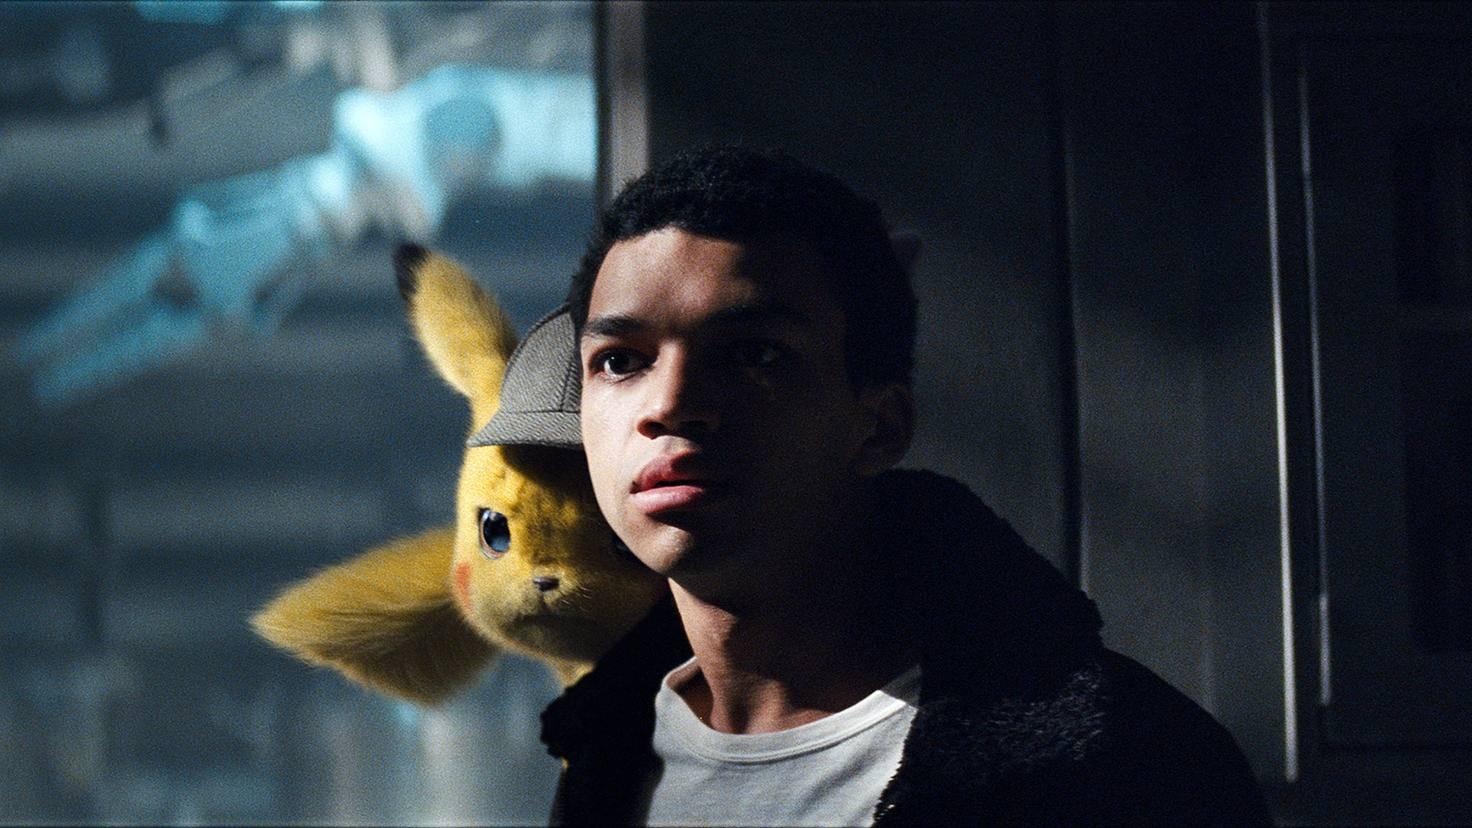 Justice Smith in Meisterdetektiv Pikachu Detective Pikachu